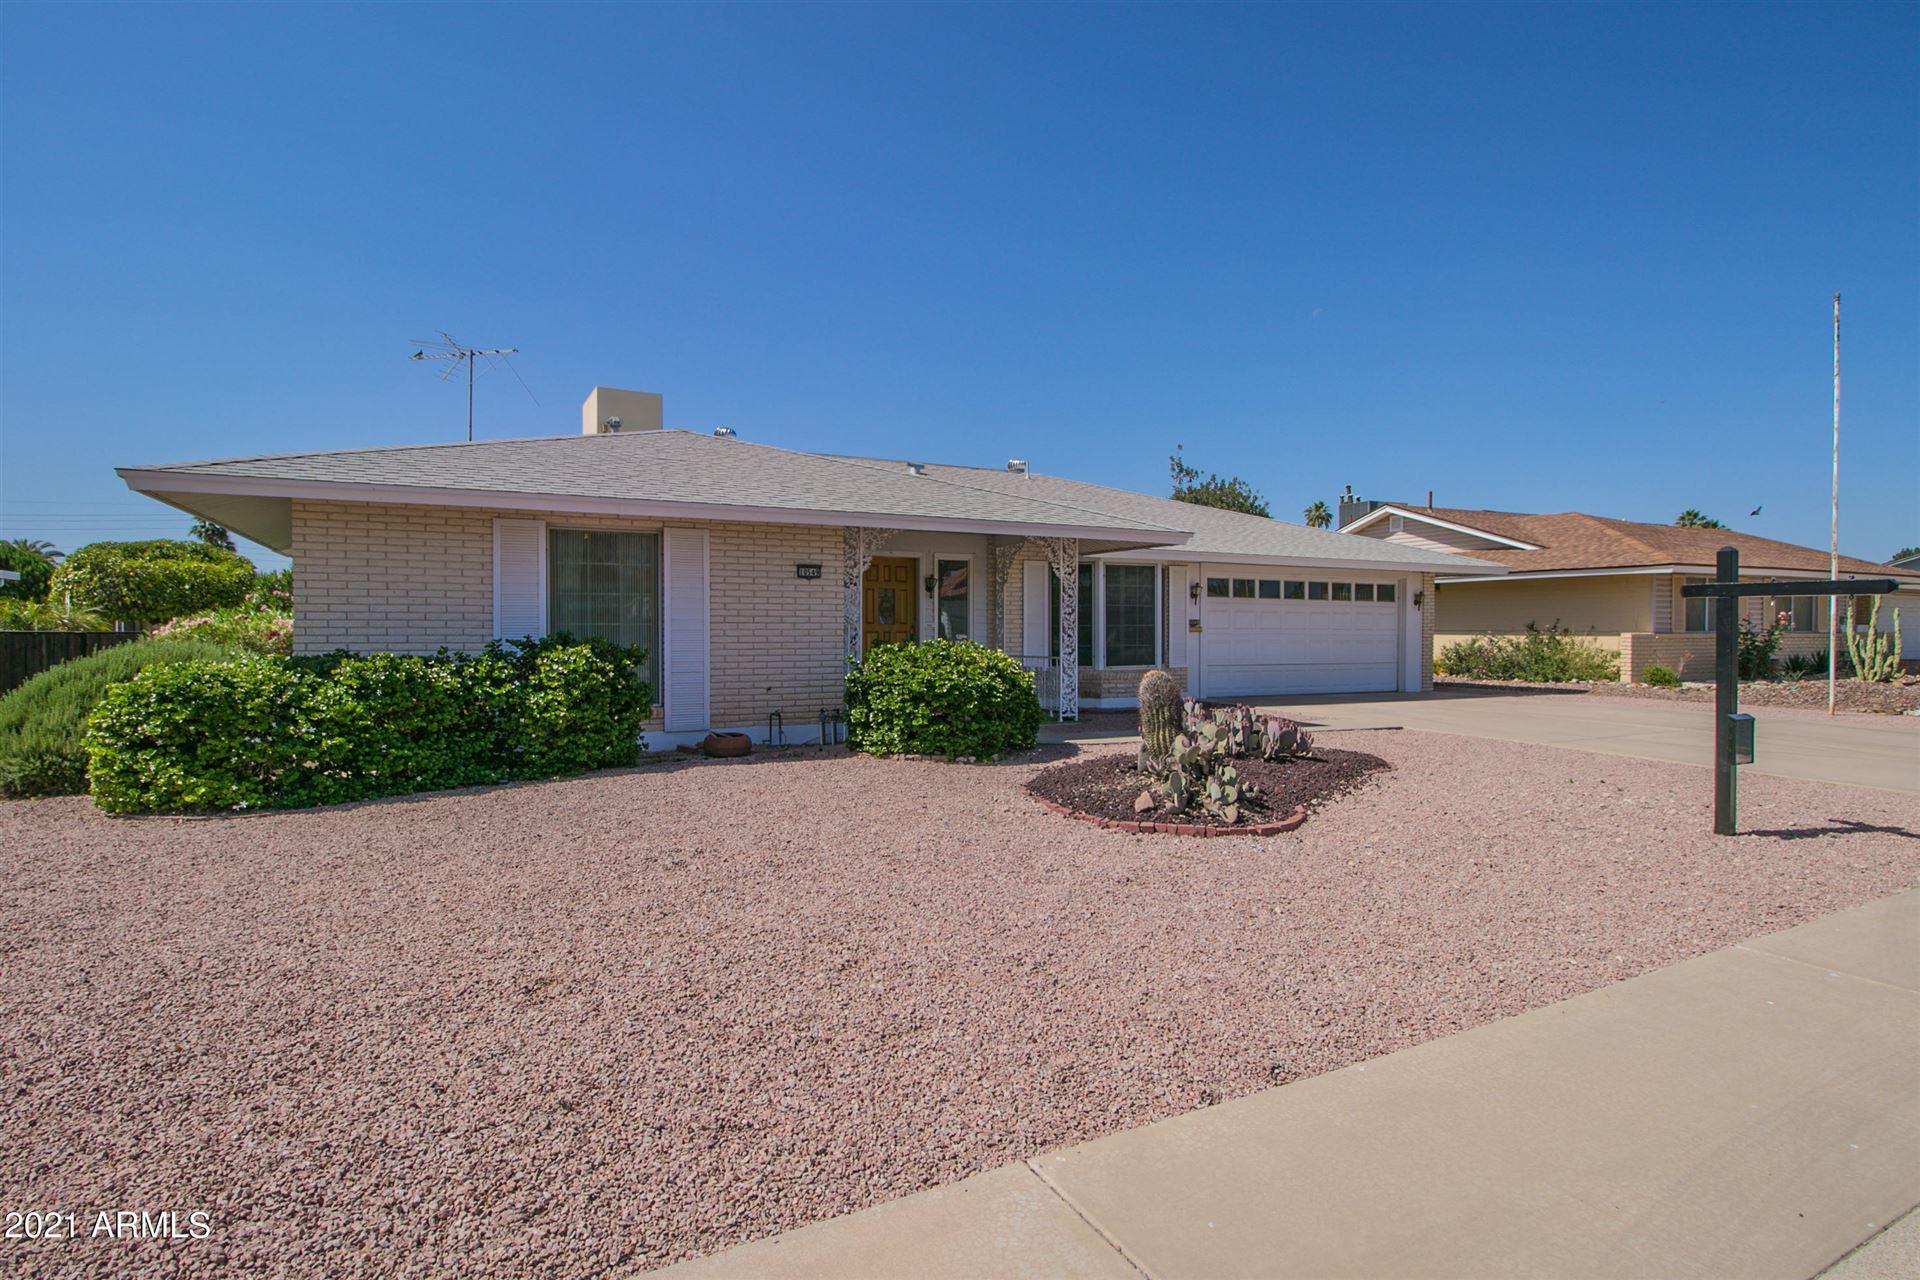 Photo of 10549 W KELSO Drive, Sun City, AZ 85351 (MLS # 6230619)